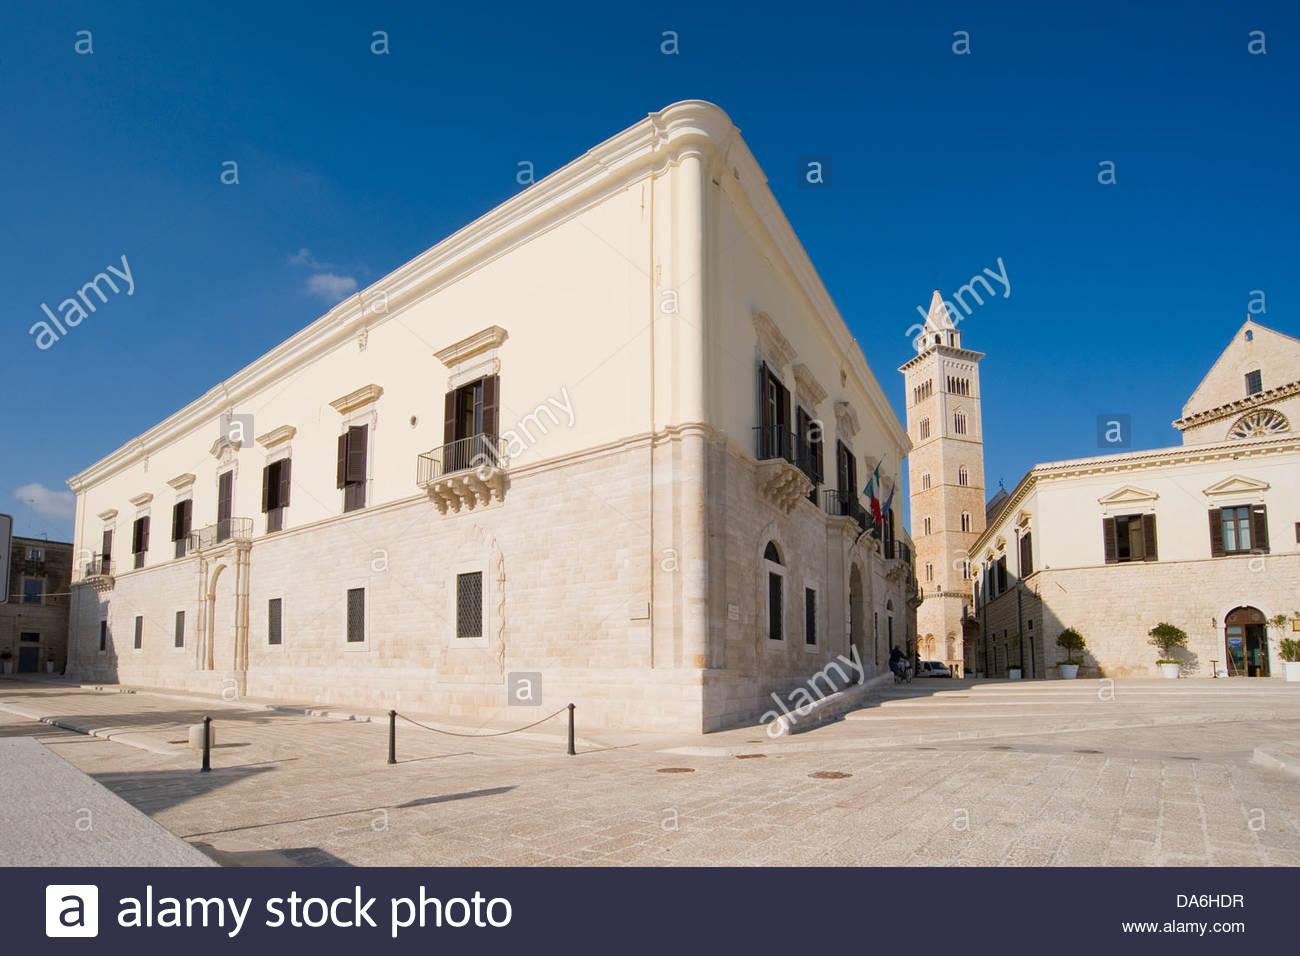 piazza sacra regia udienza,trani,puglia,italy - Stock Image